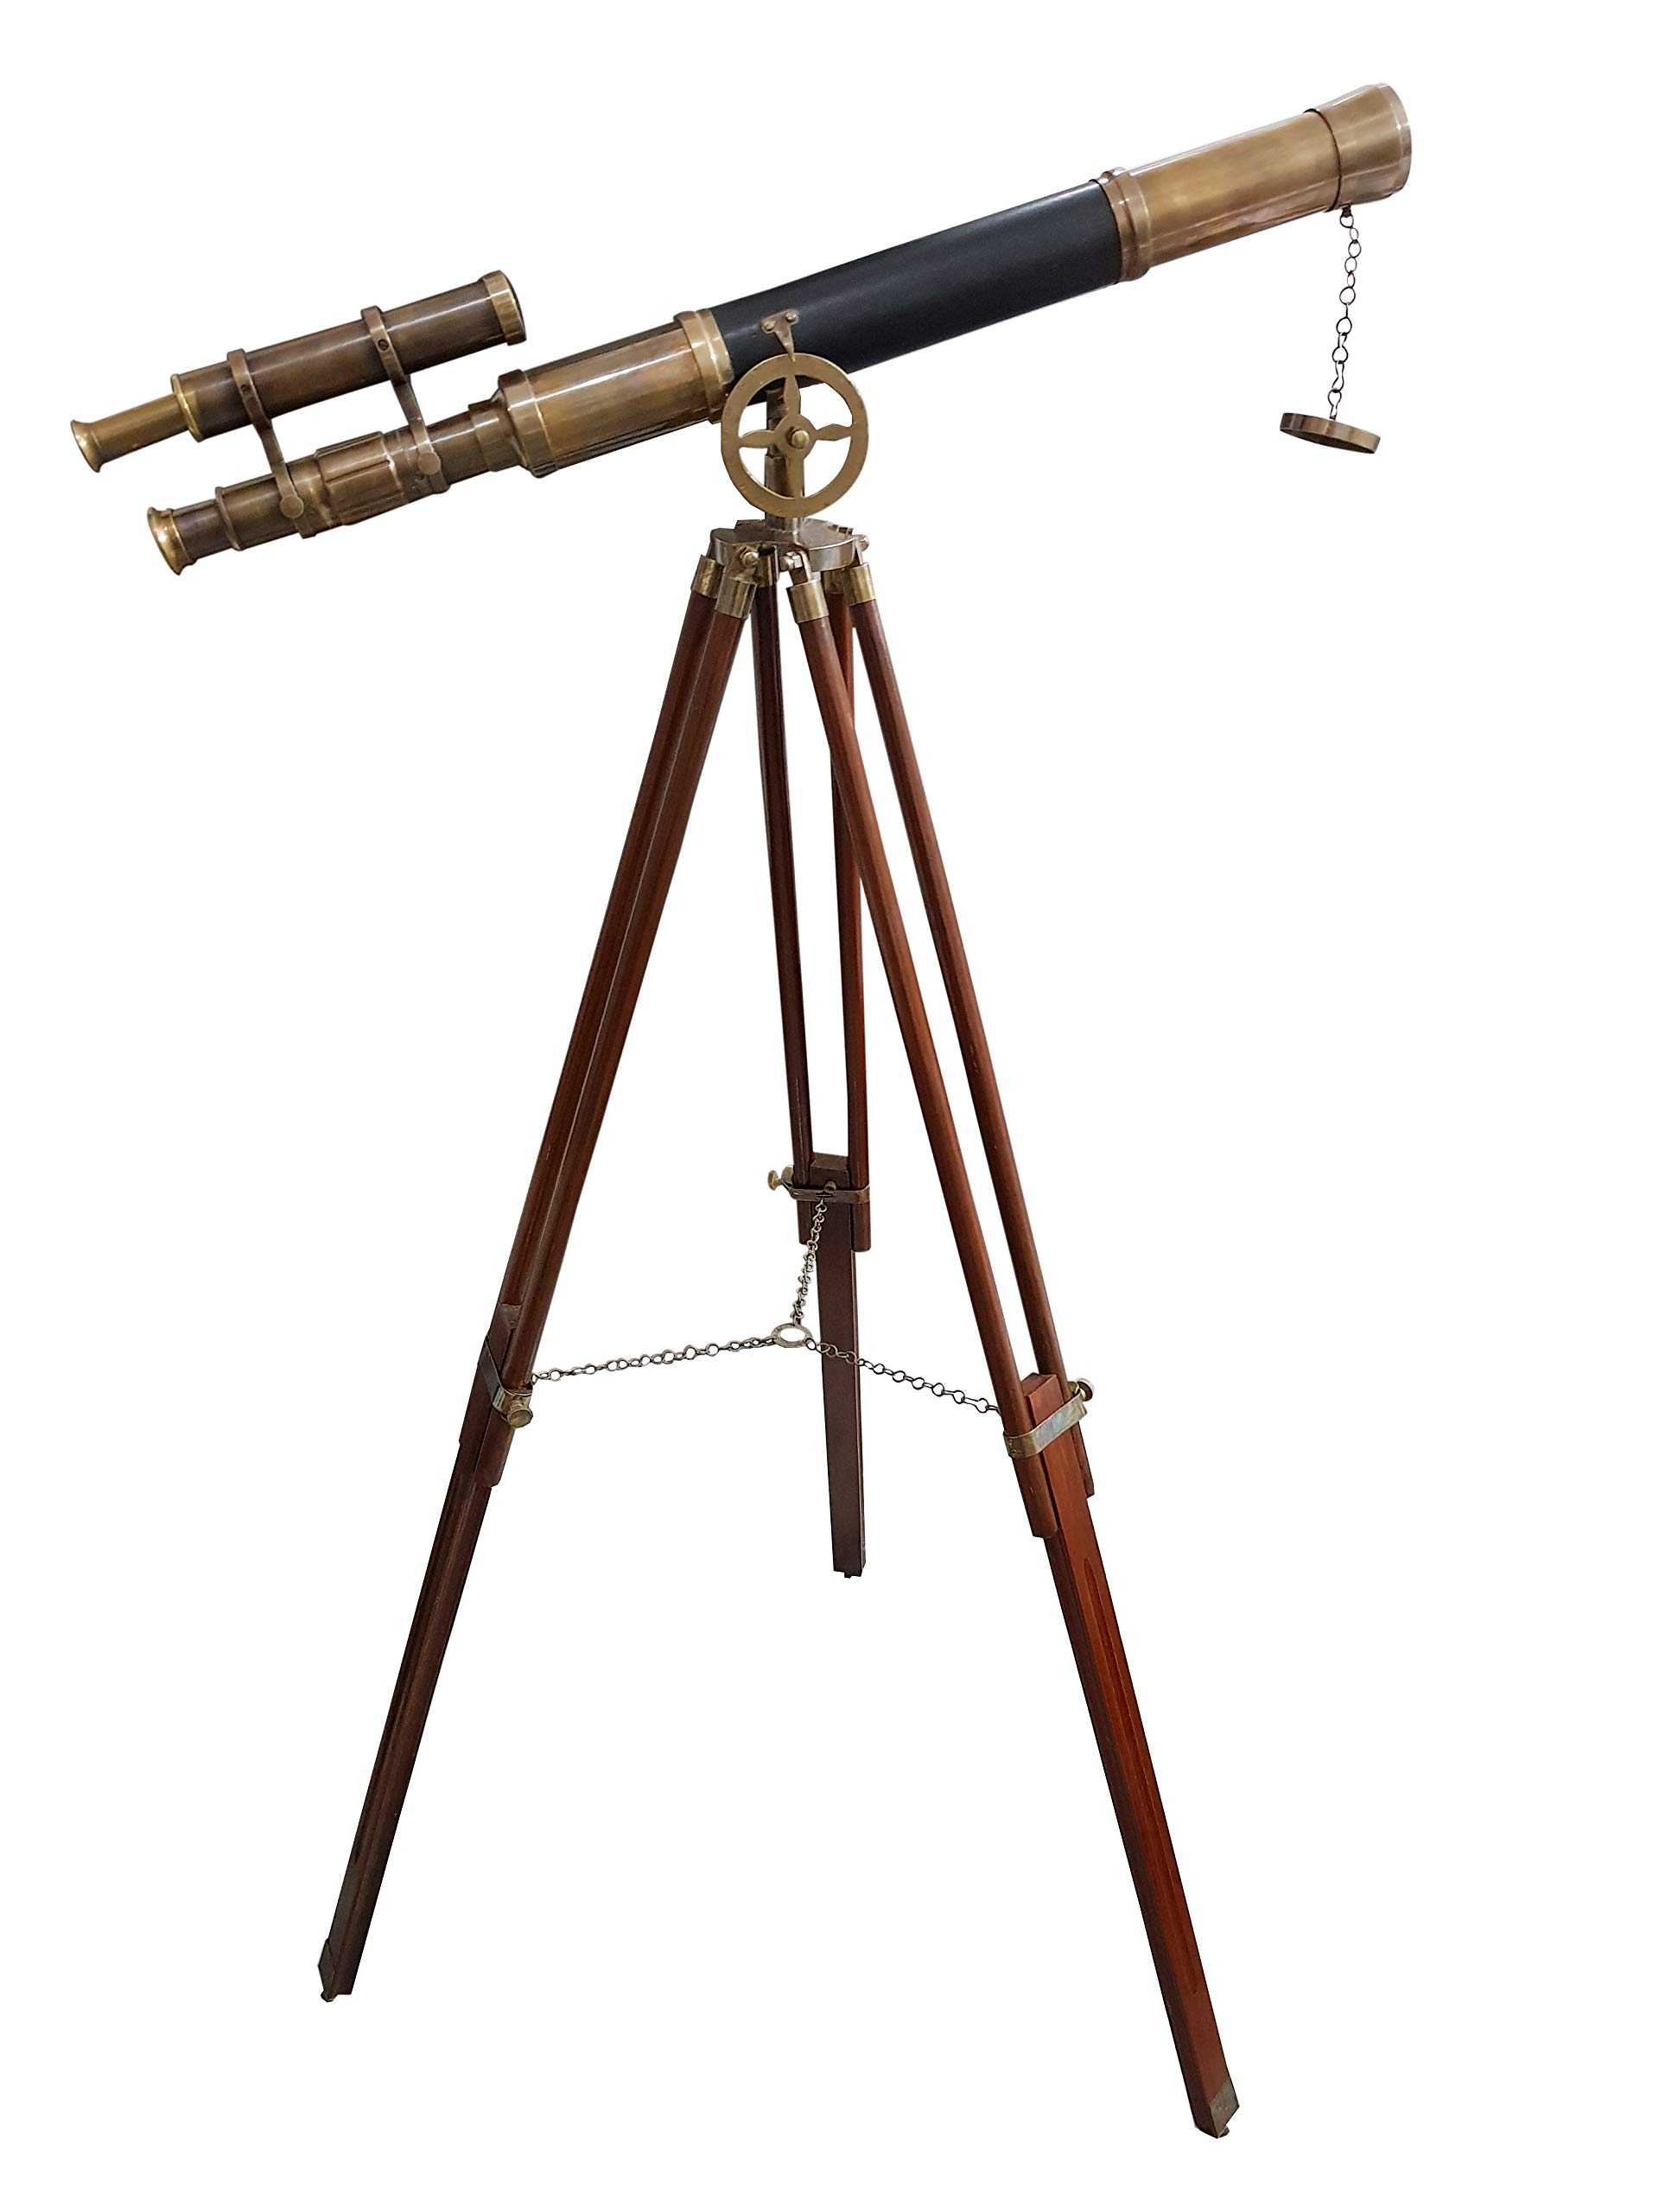 Maritime Brass Antique Double Barrel Designer Telescope with Wooden Tripod Floor Standing Telescopic tripods - collectiblesBuy